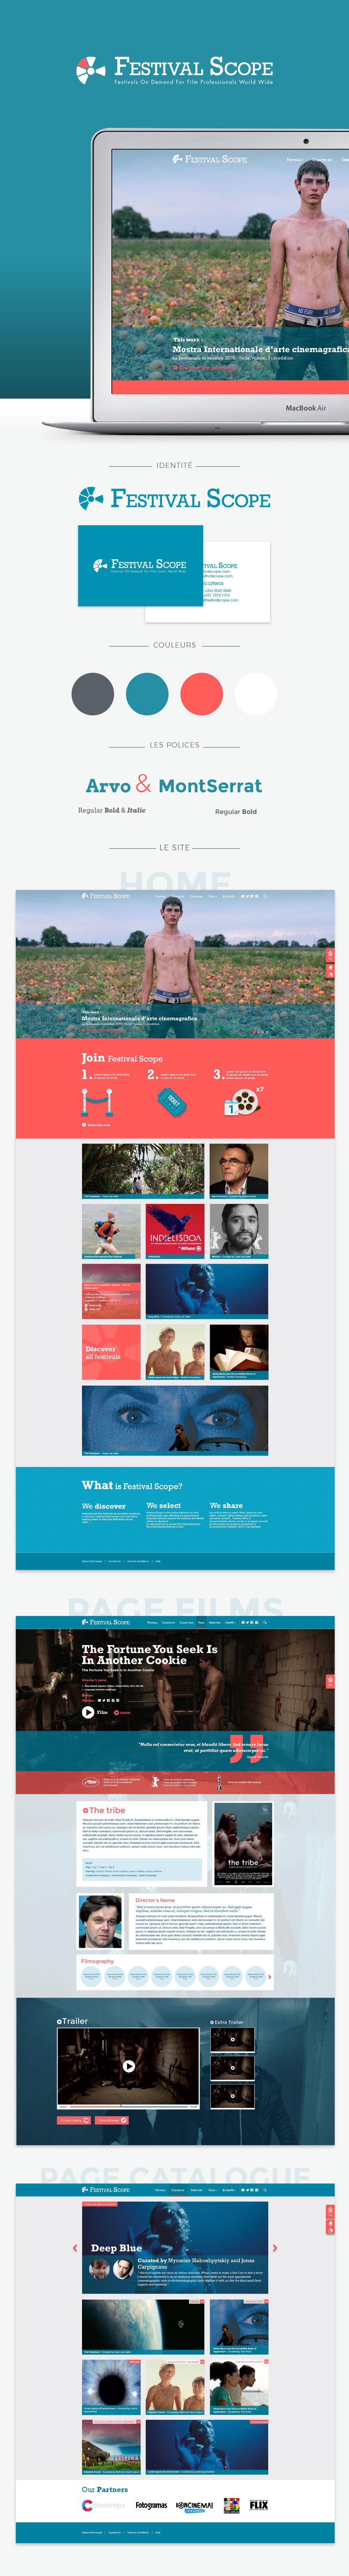 festivalscope-identite-site